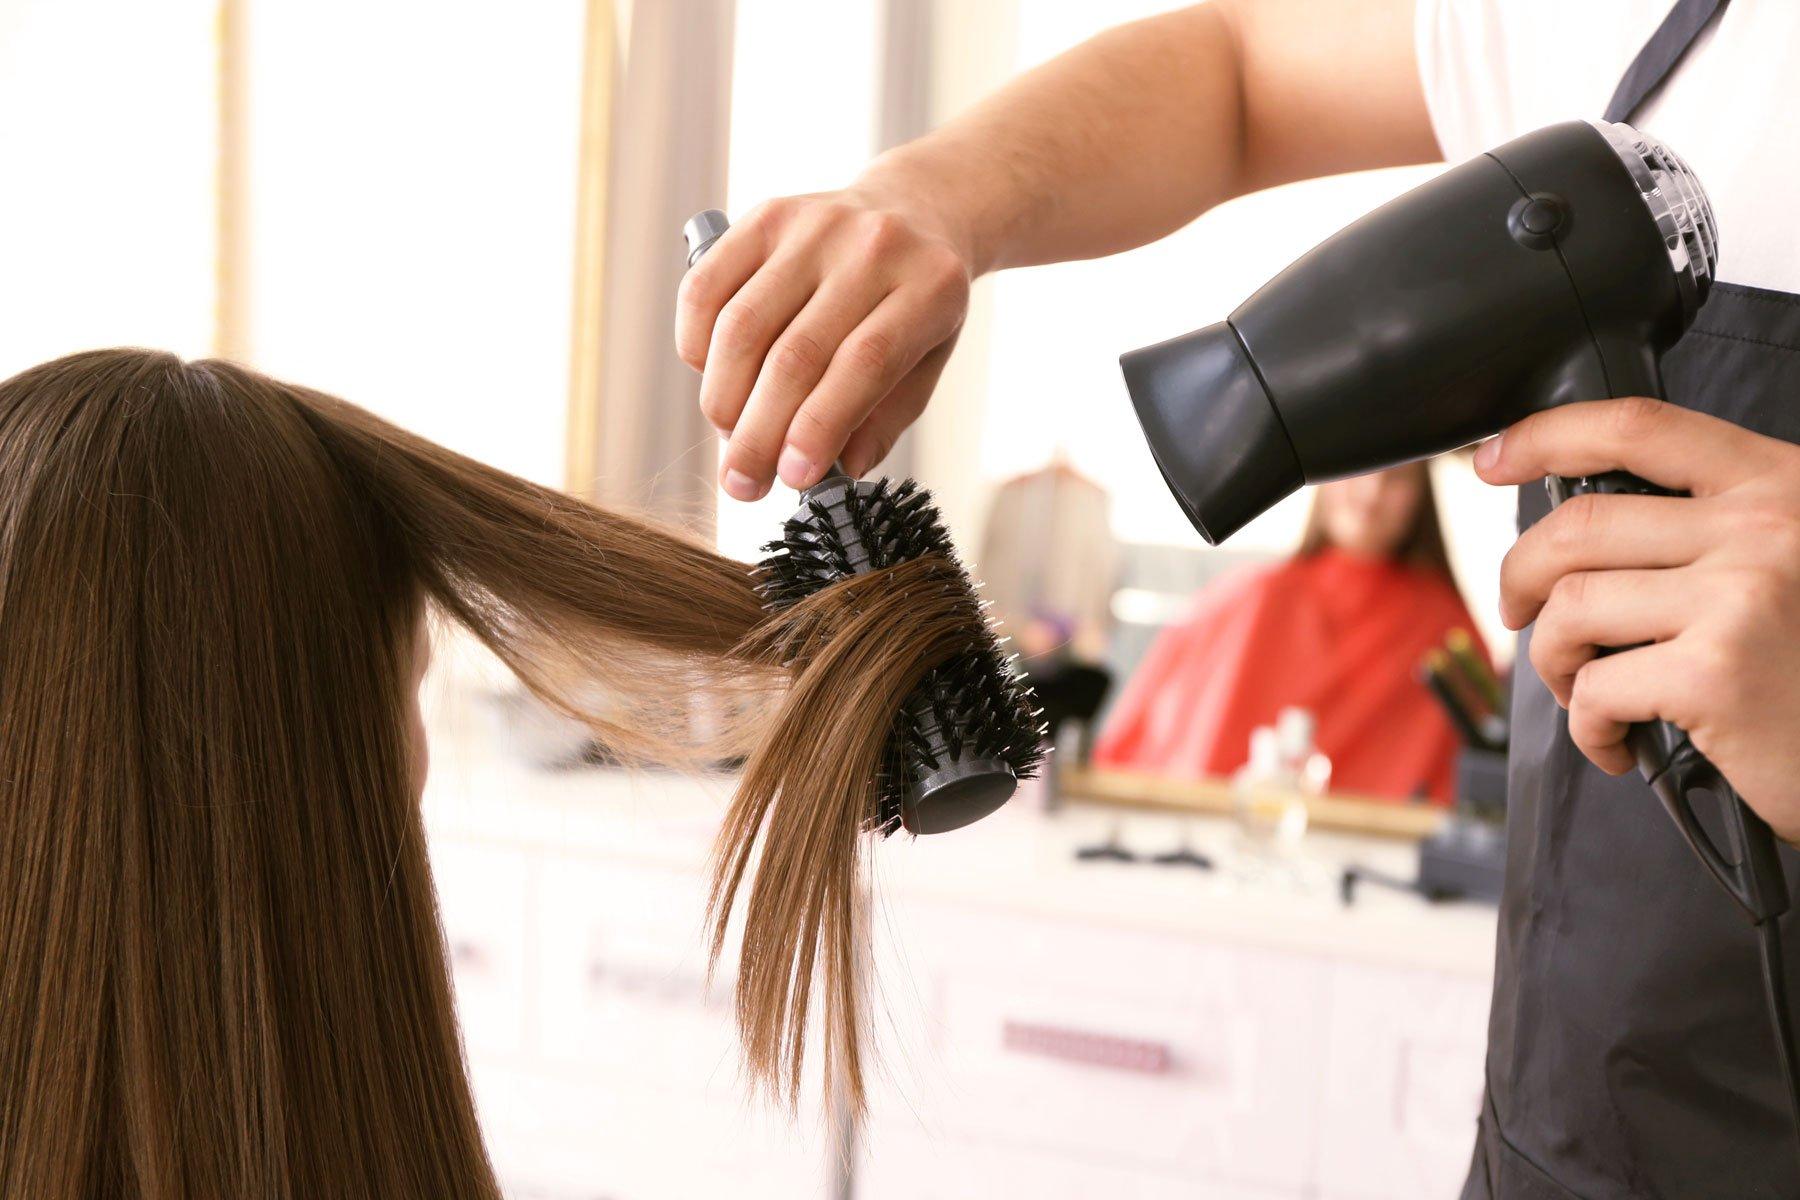 Una parrucchiara arriccia i capelli di una donna